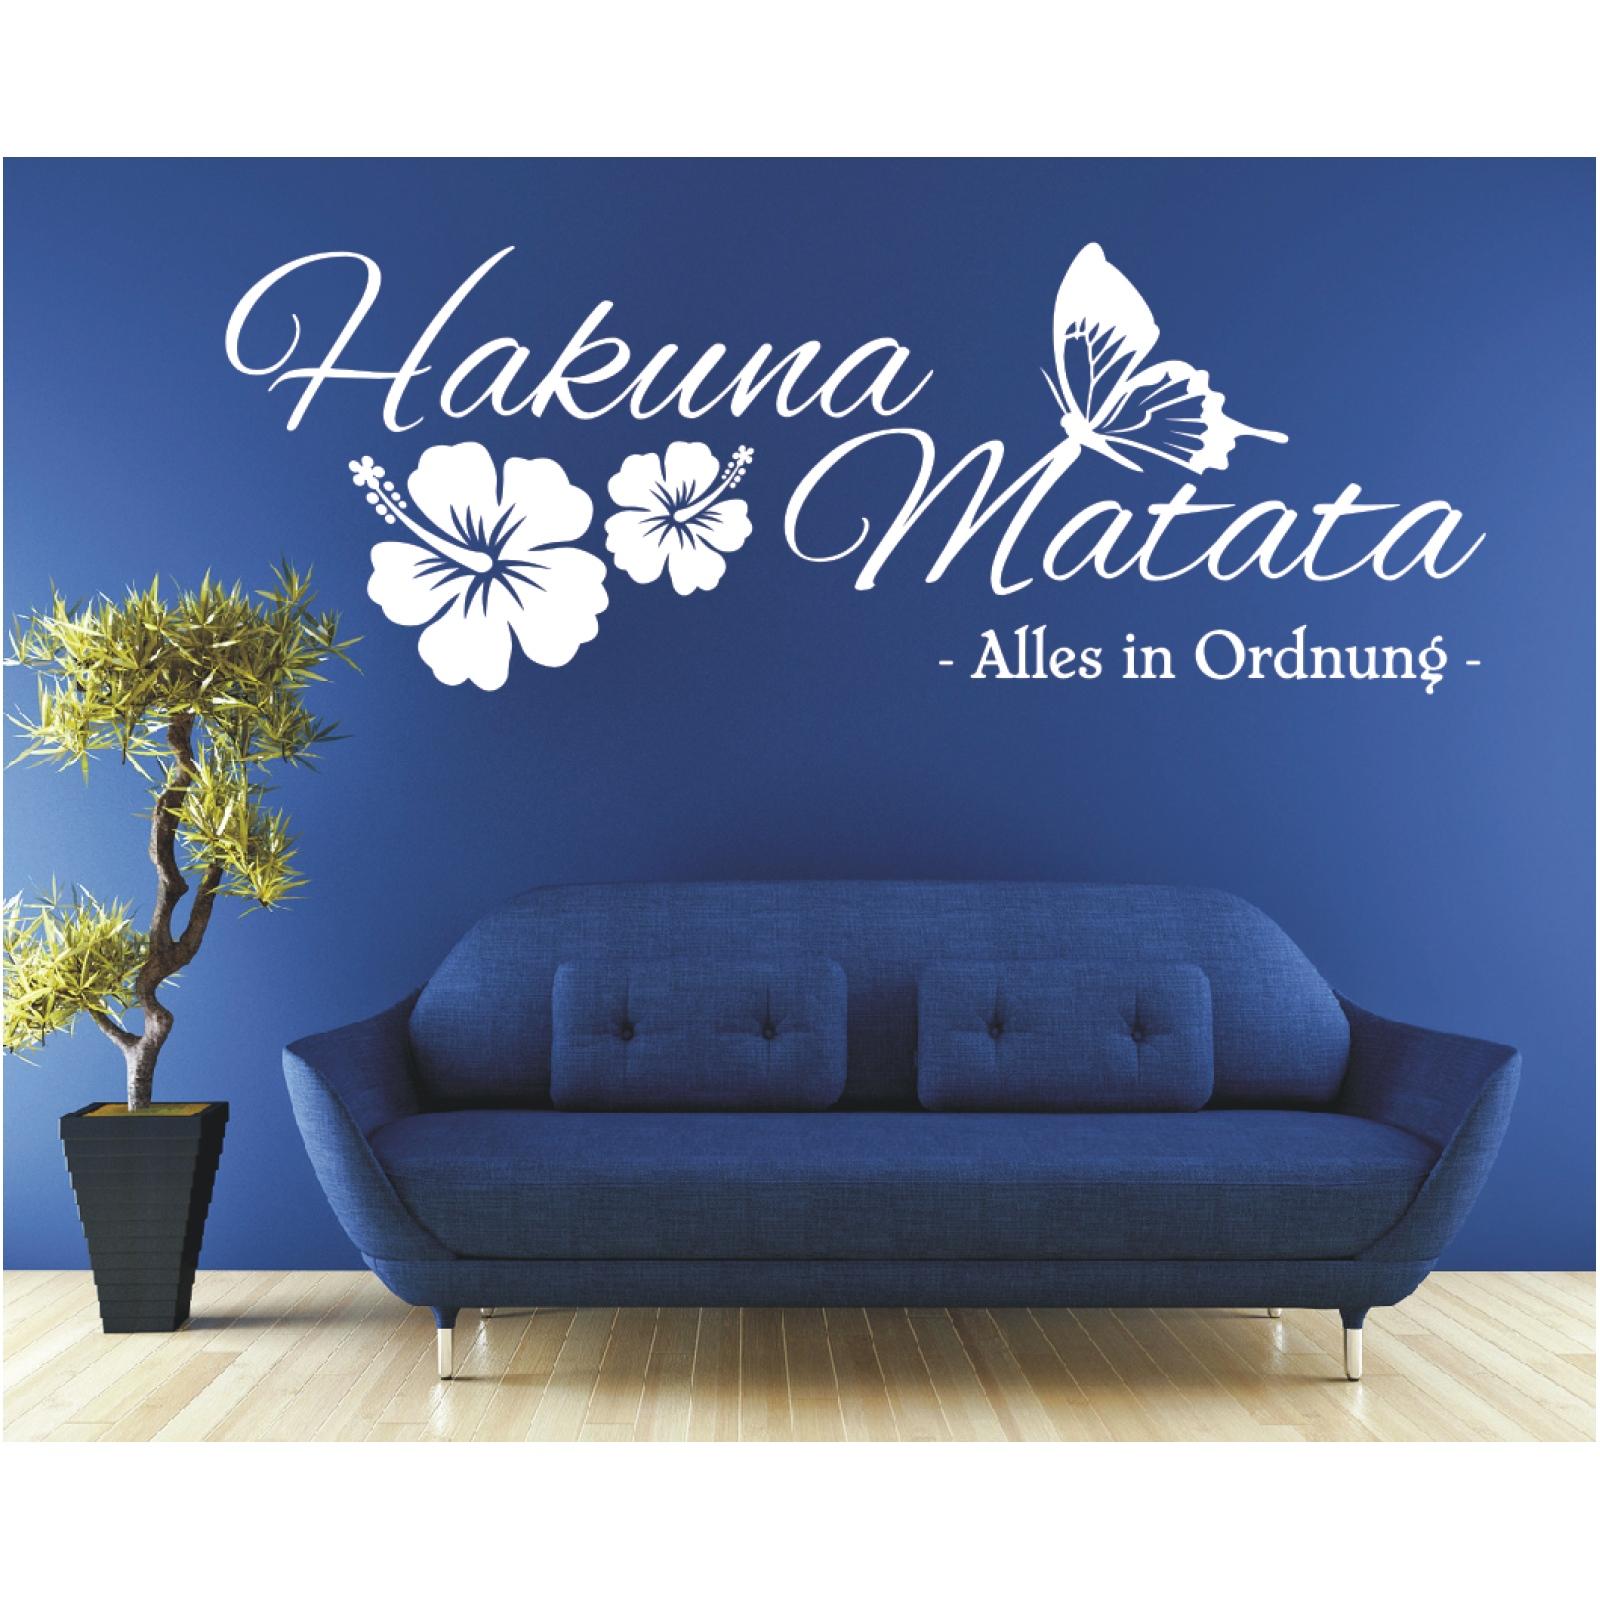 Wall Tattoo Saying Hakuna Matata Alright Sticker Wall Decal 1